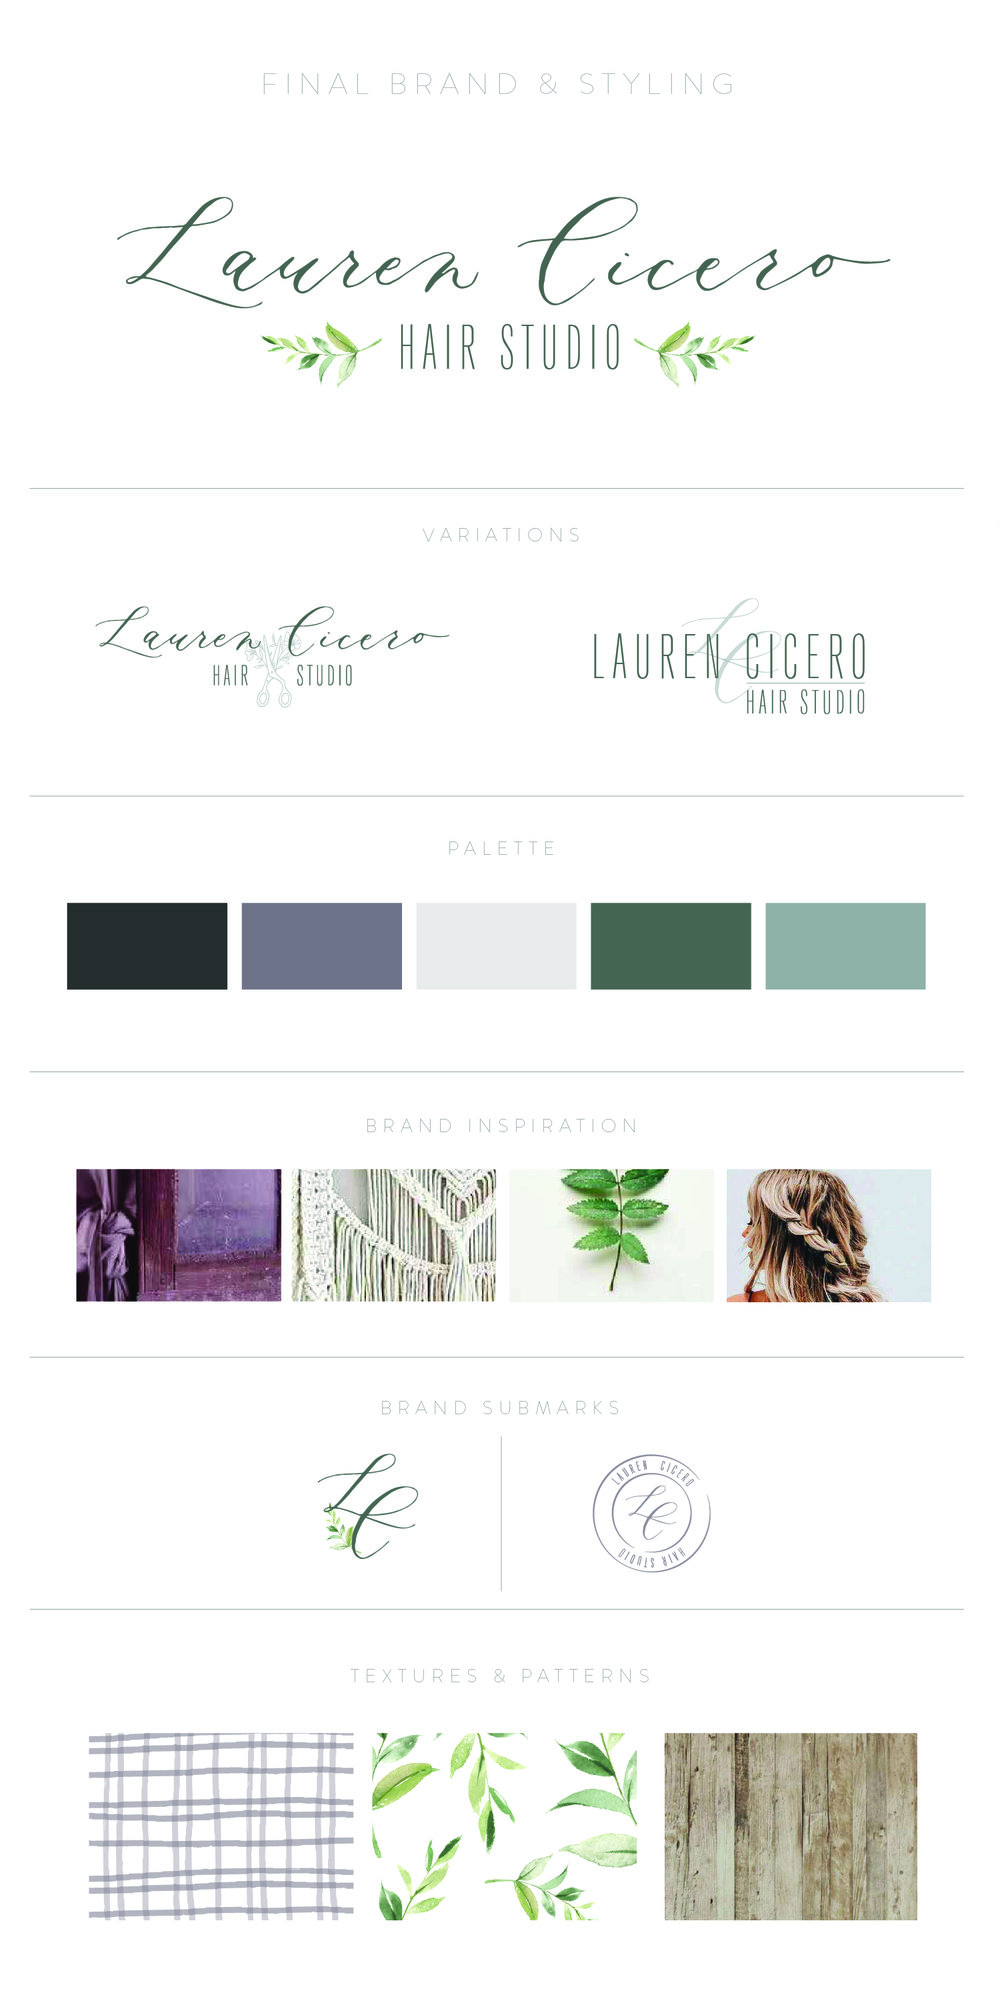 Brand_Style-01.jpg